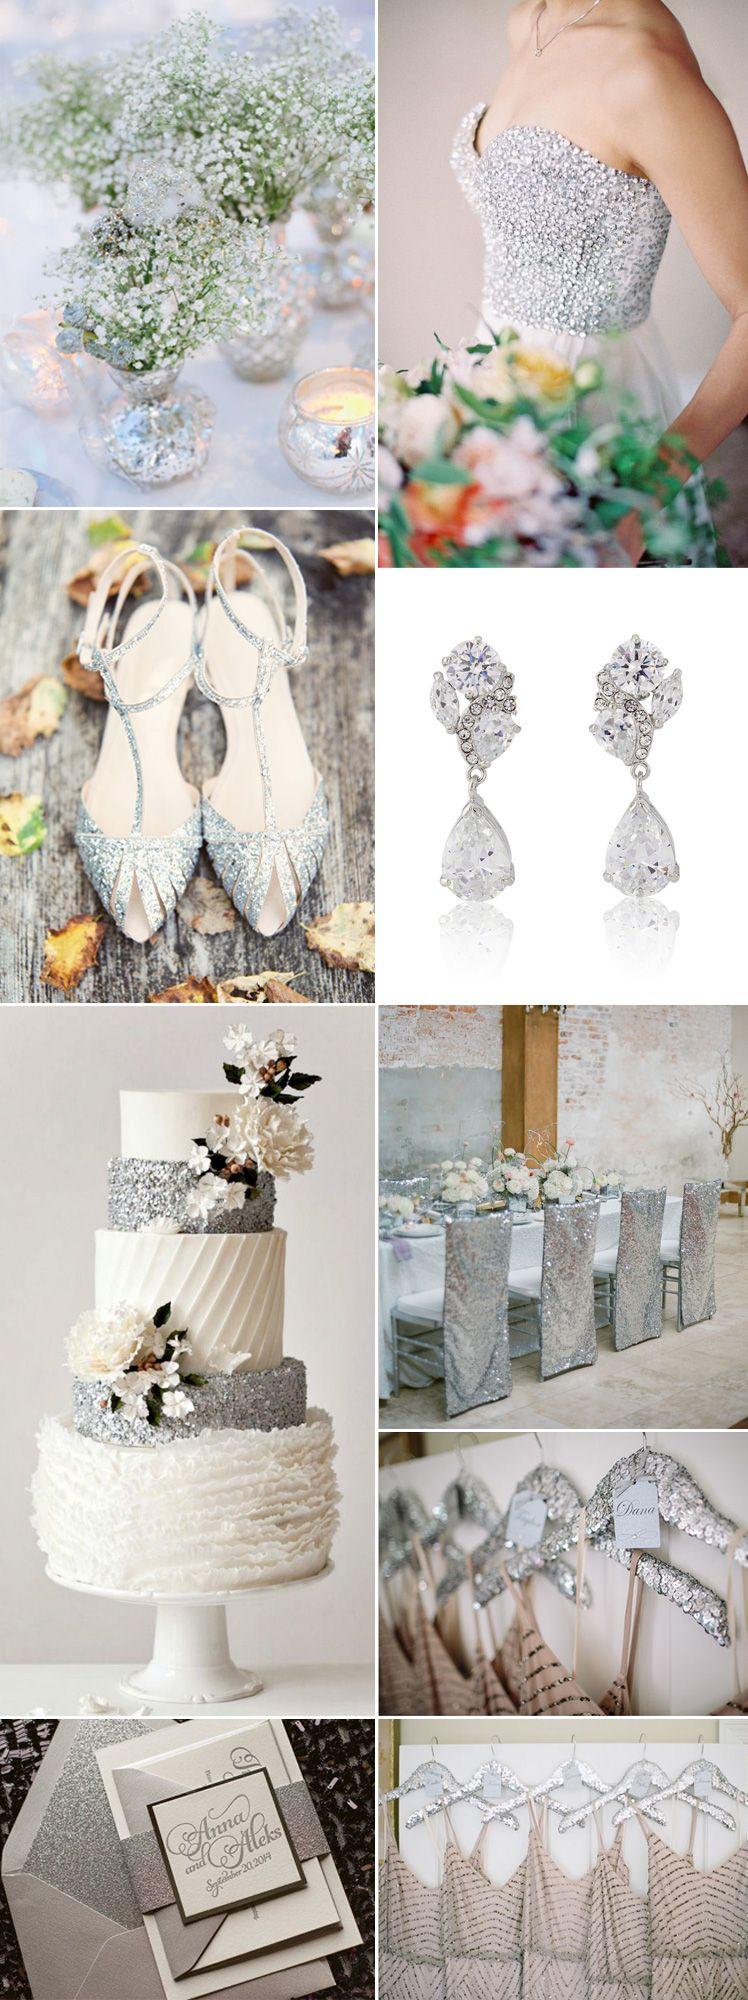 April\'s Diamond - Birthstone Wedding Inspiration | Diamond wedding ...